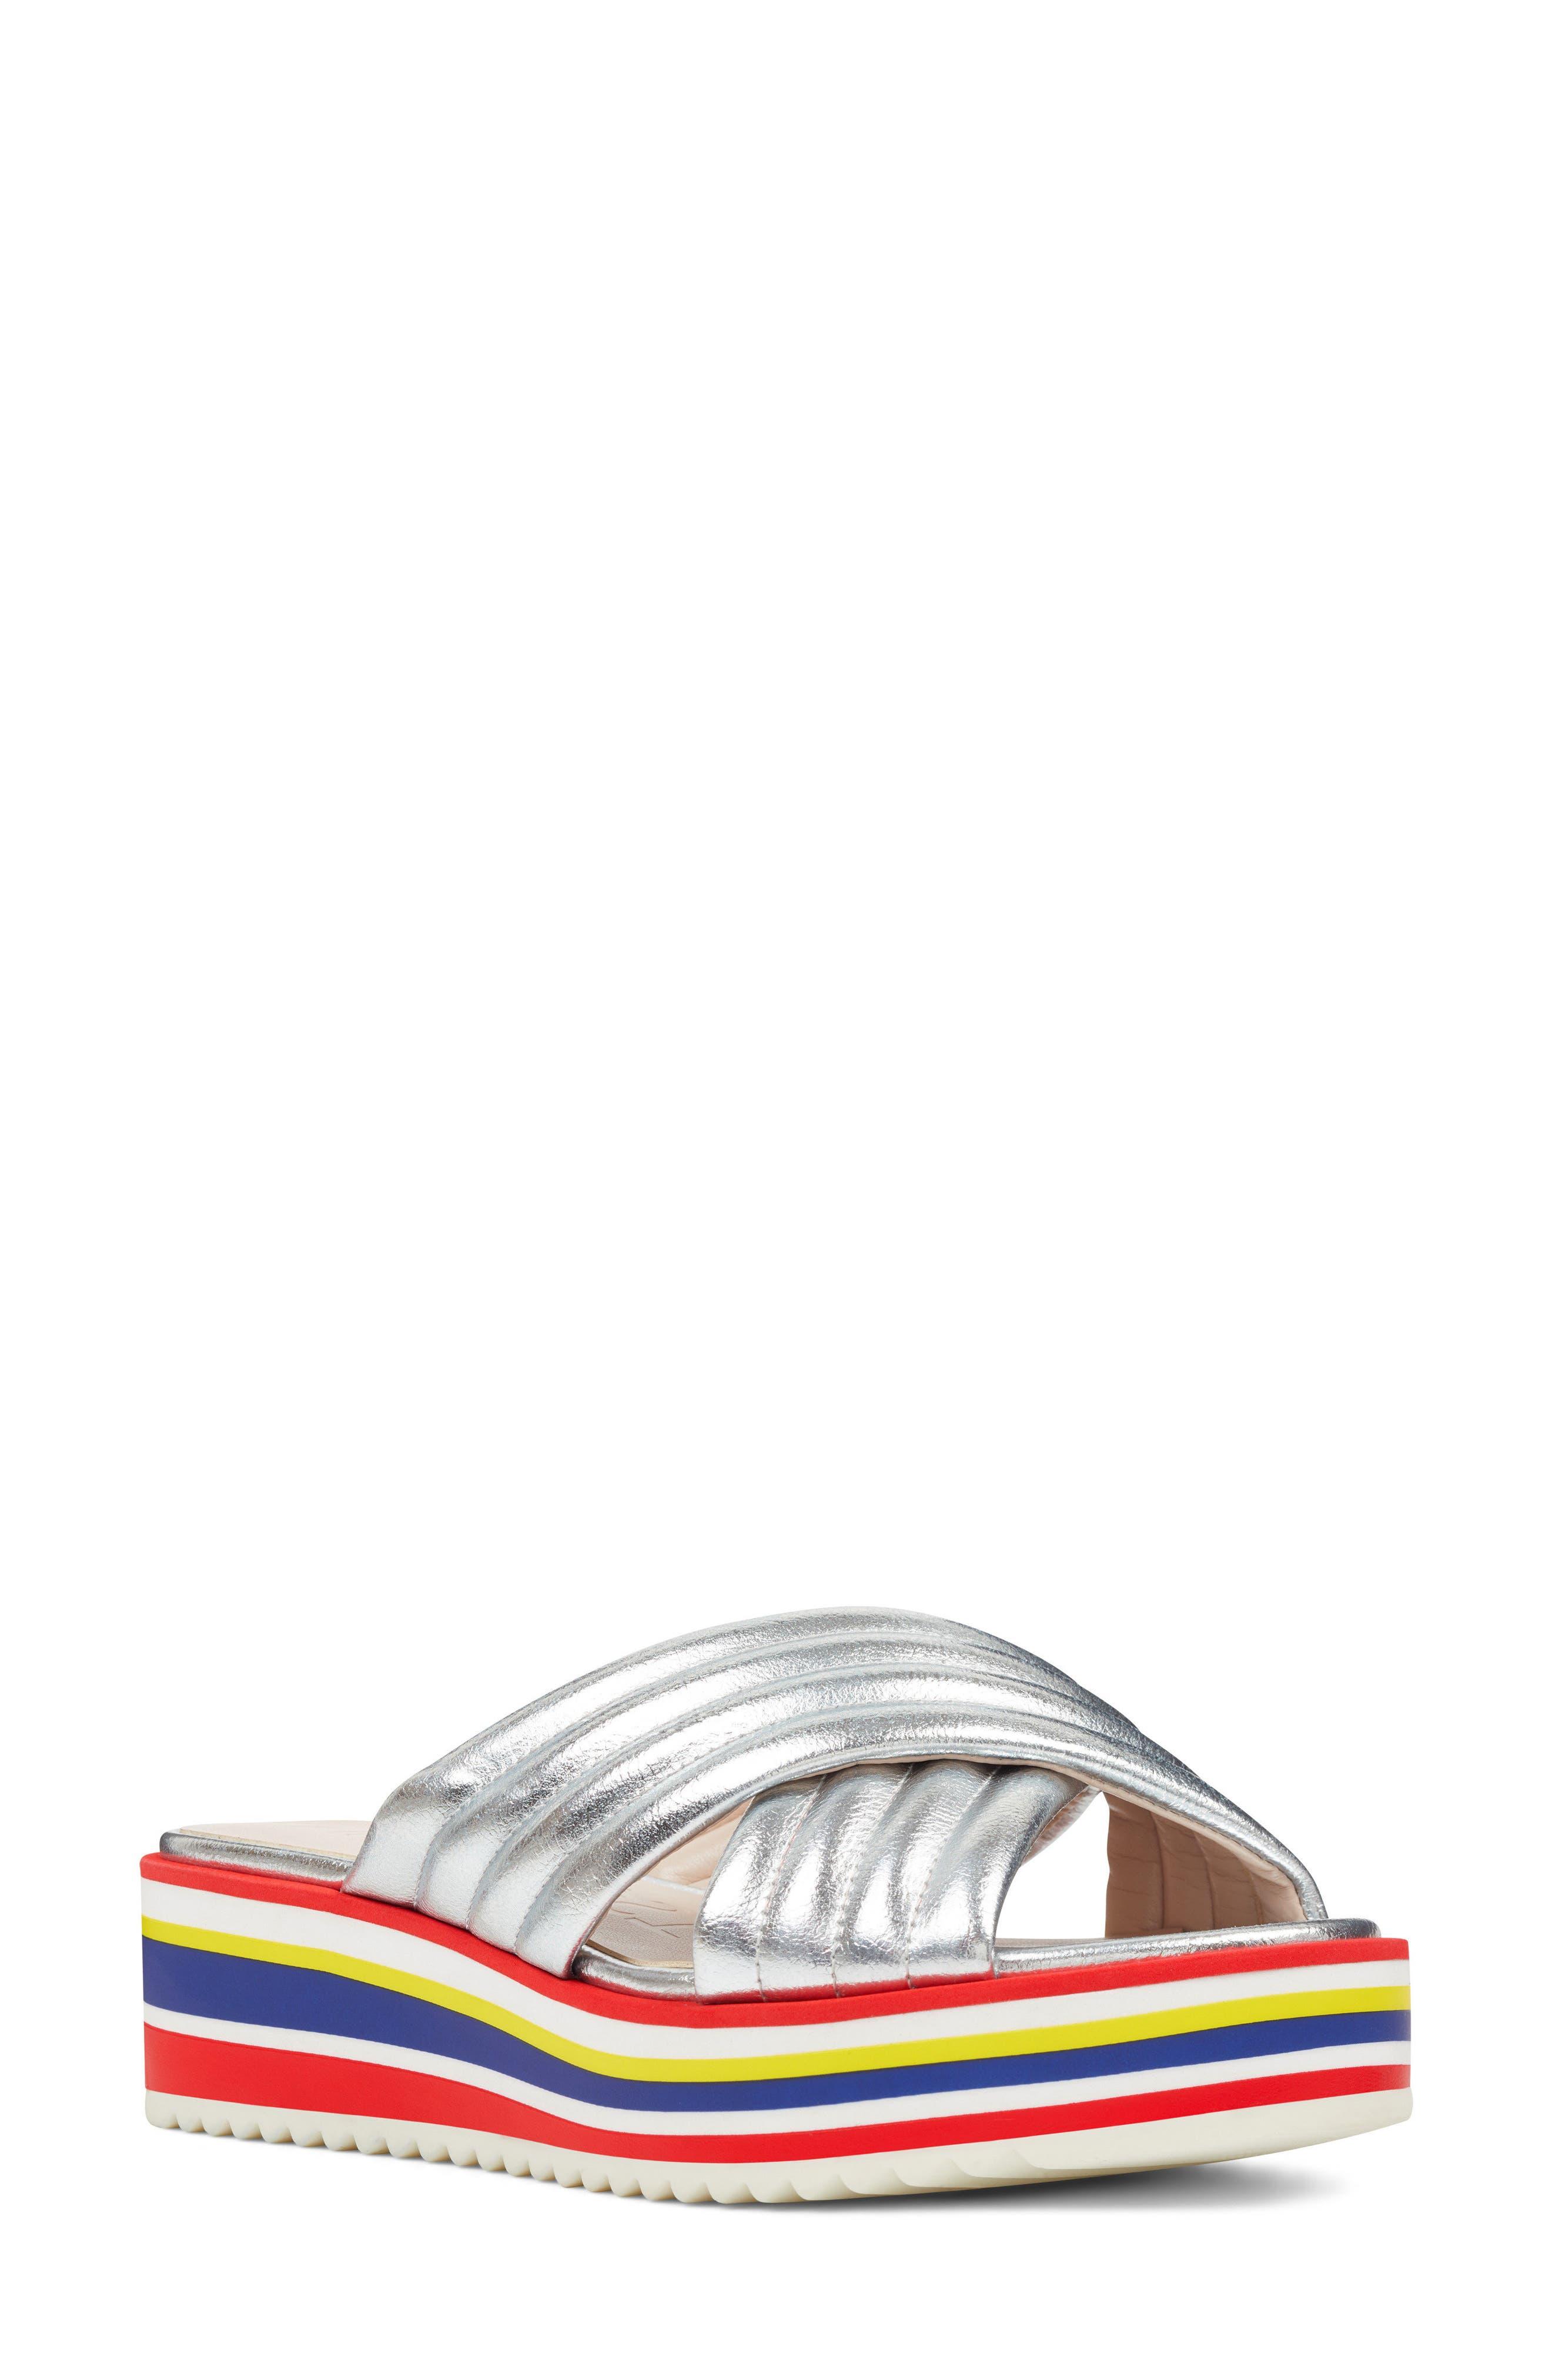 Zonita Platform Slide Sandal,                         Main,                         color, Silver Faux Leather